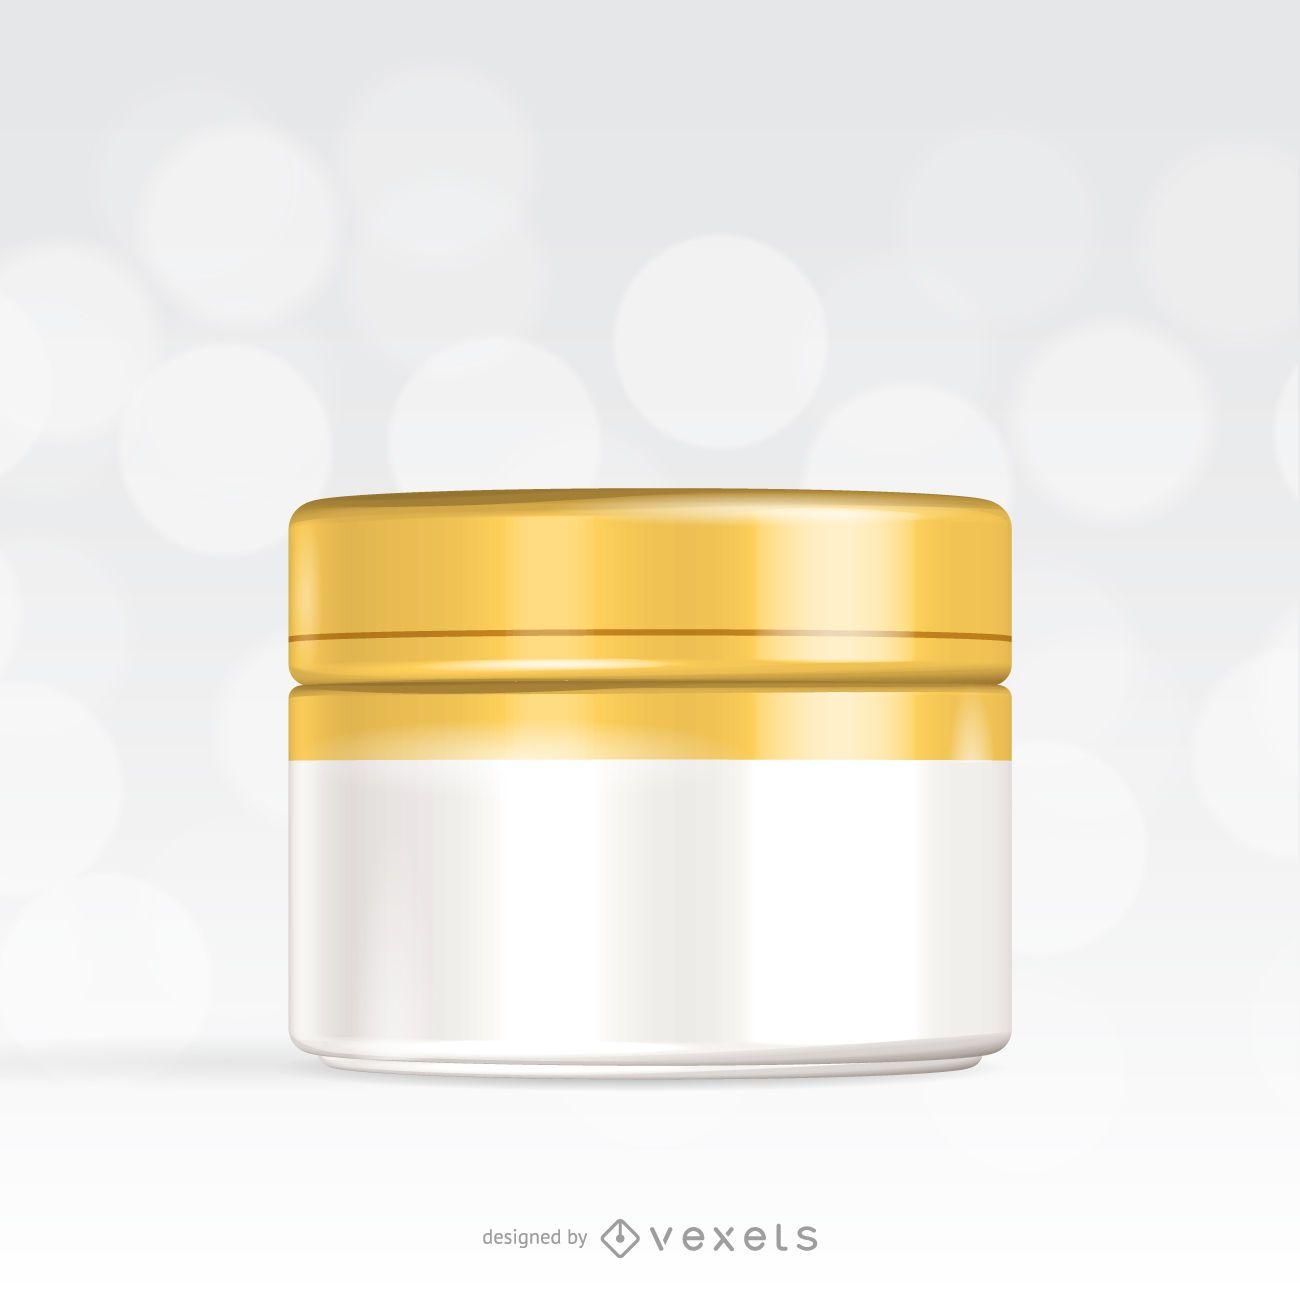 Cream packaging template mockup